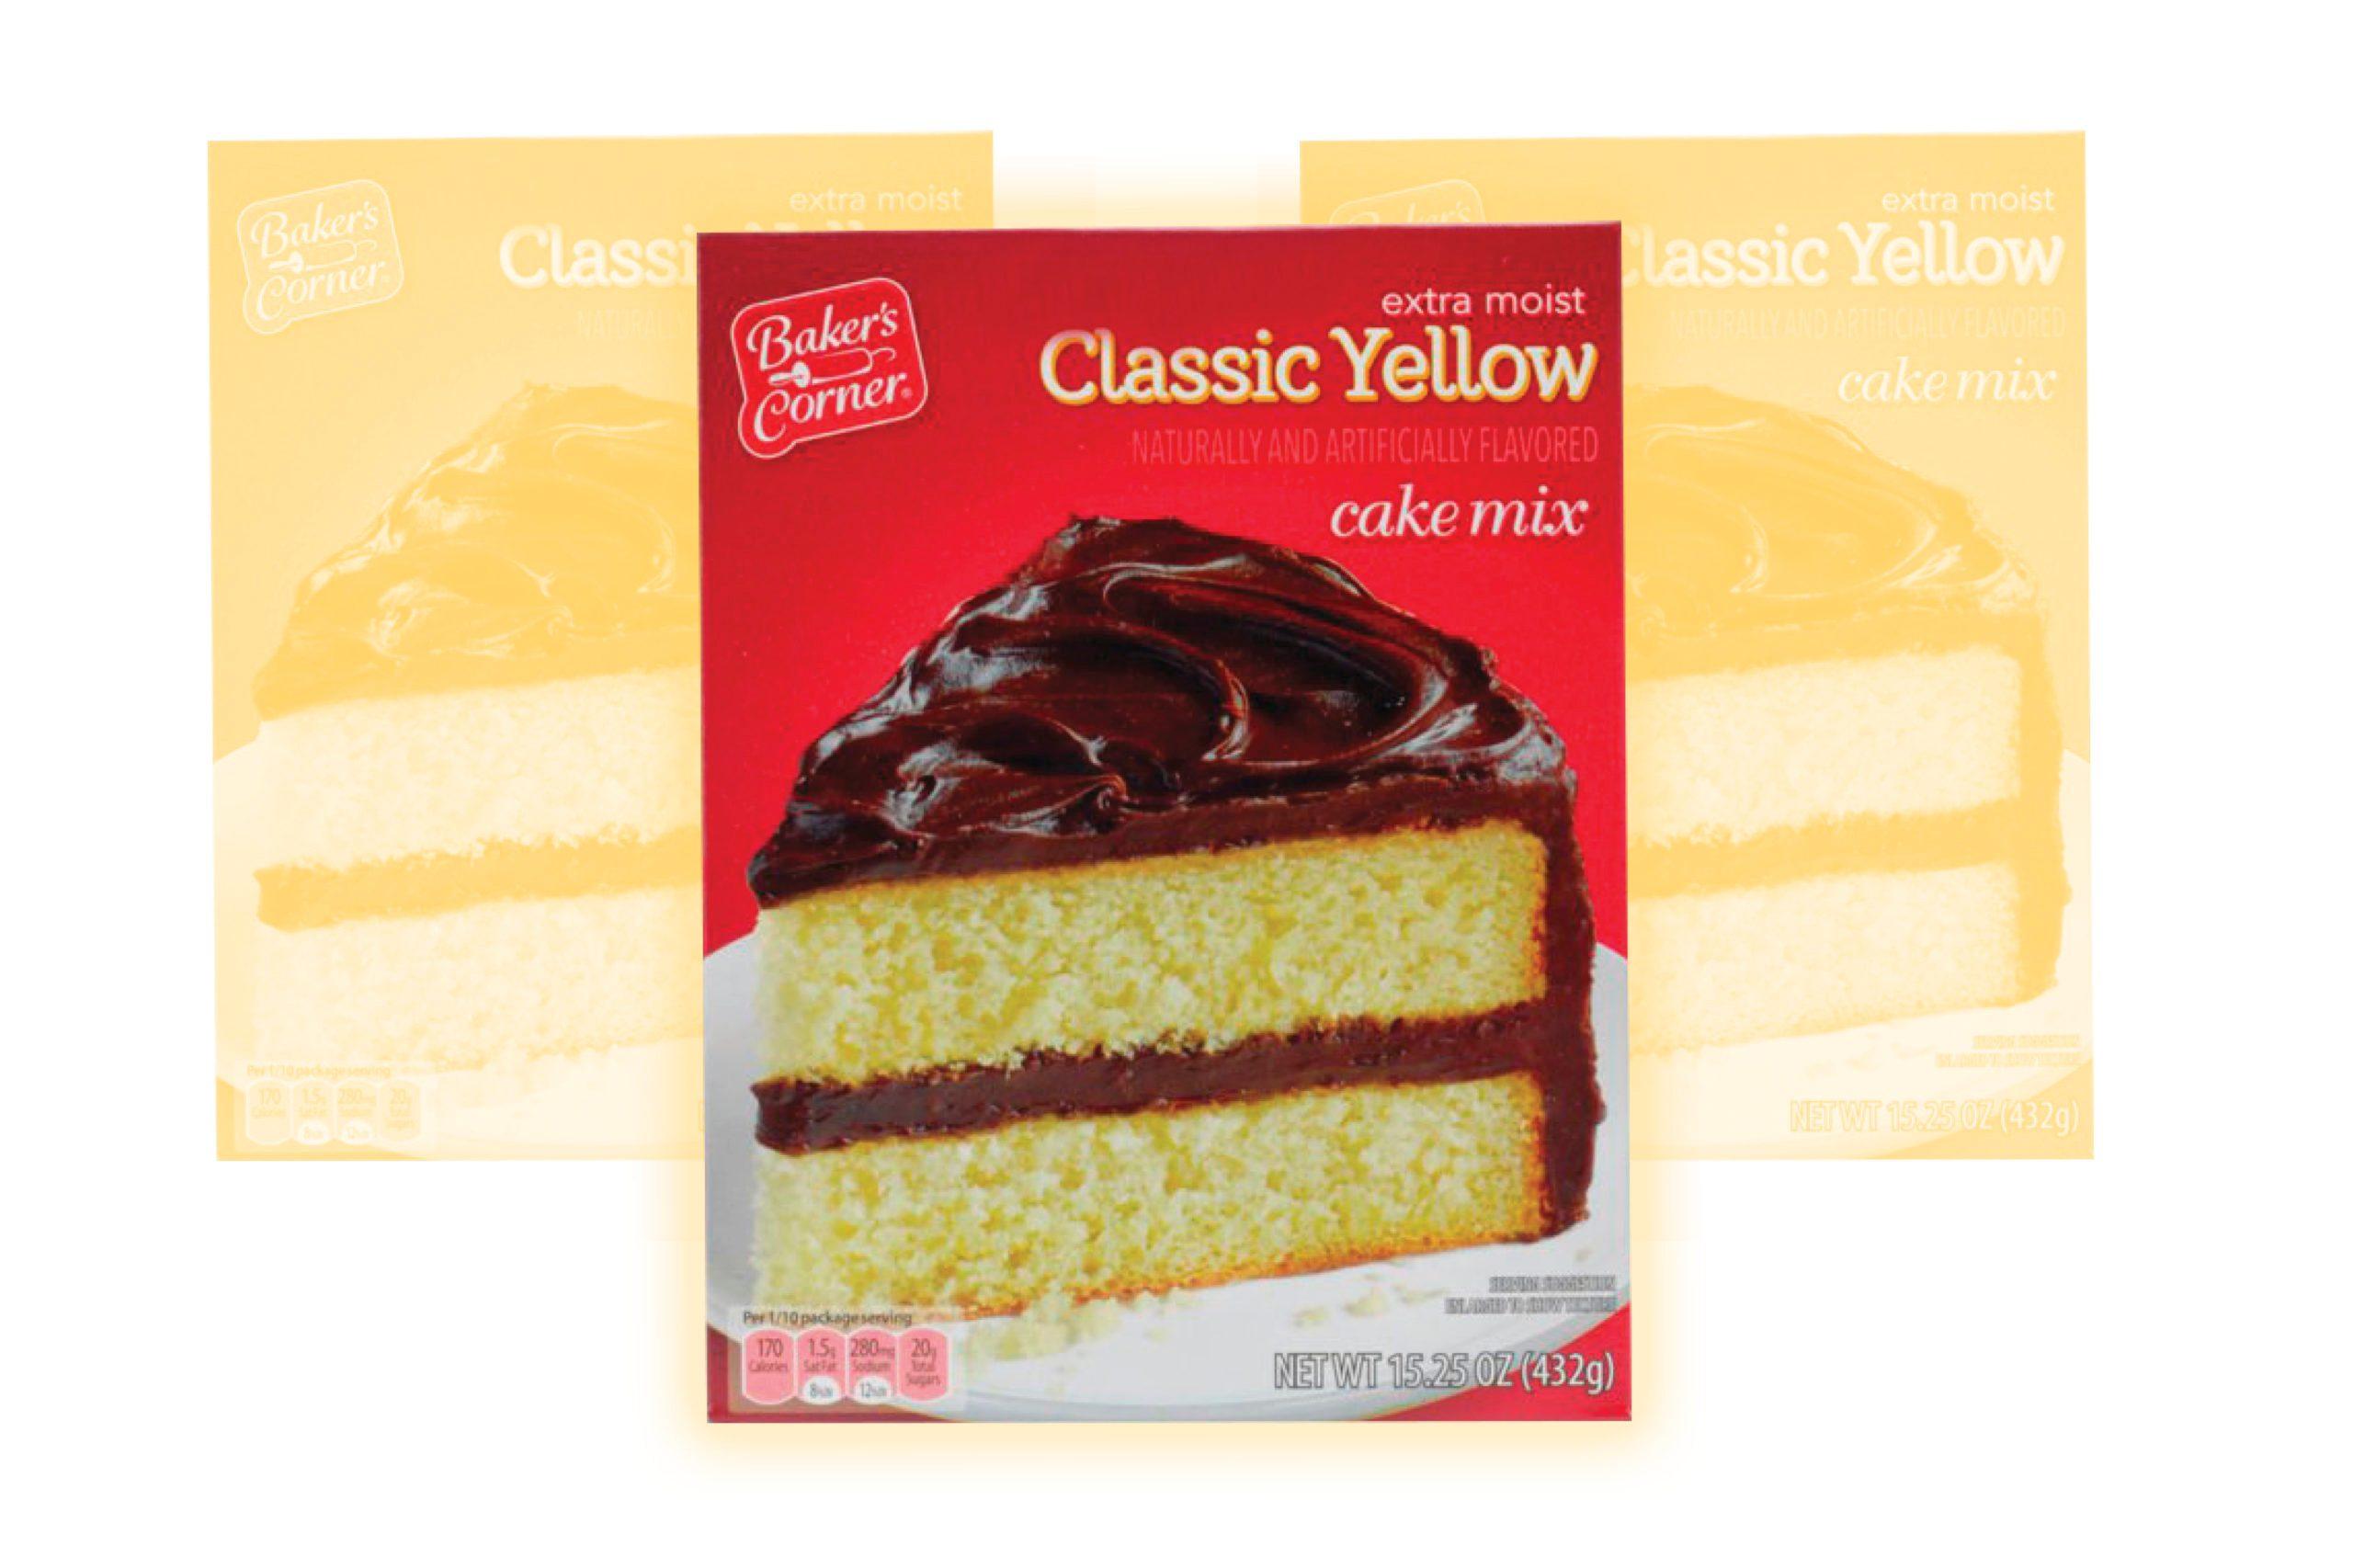 Aldi Baker's Corner Classic Yellow cake mix